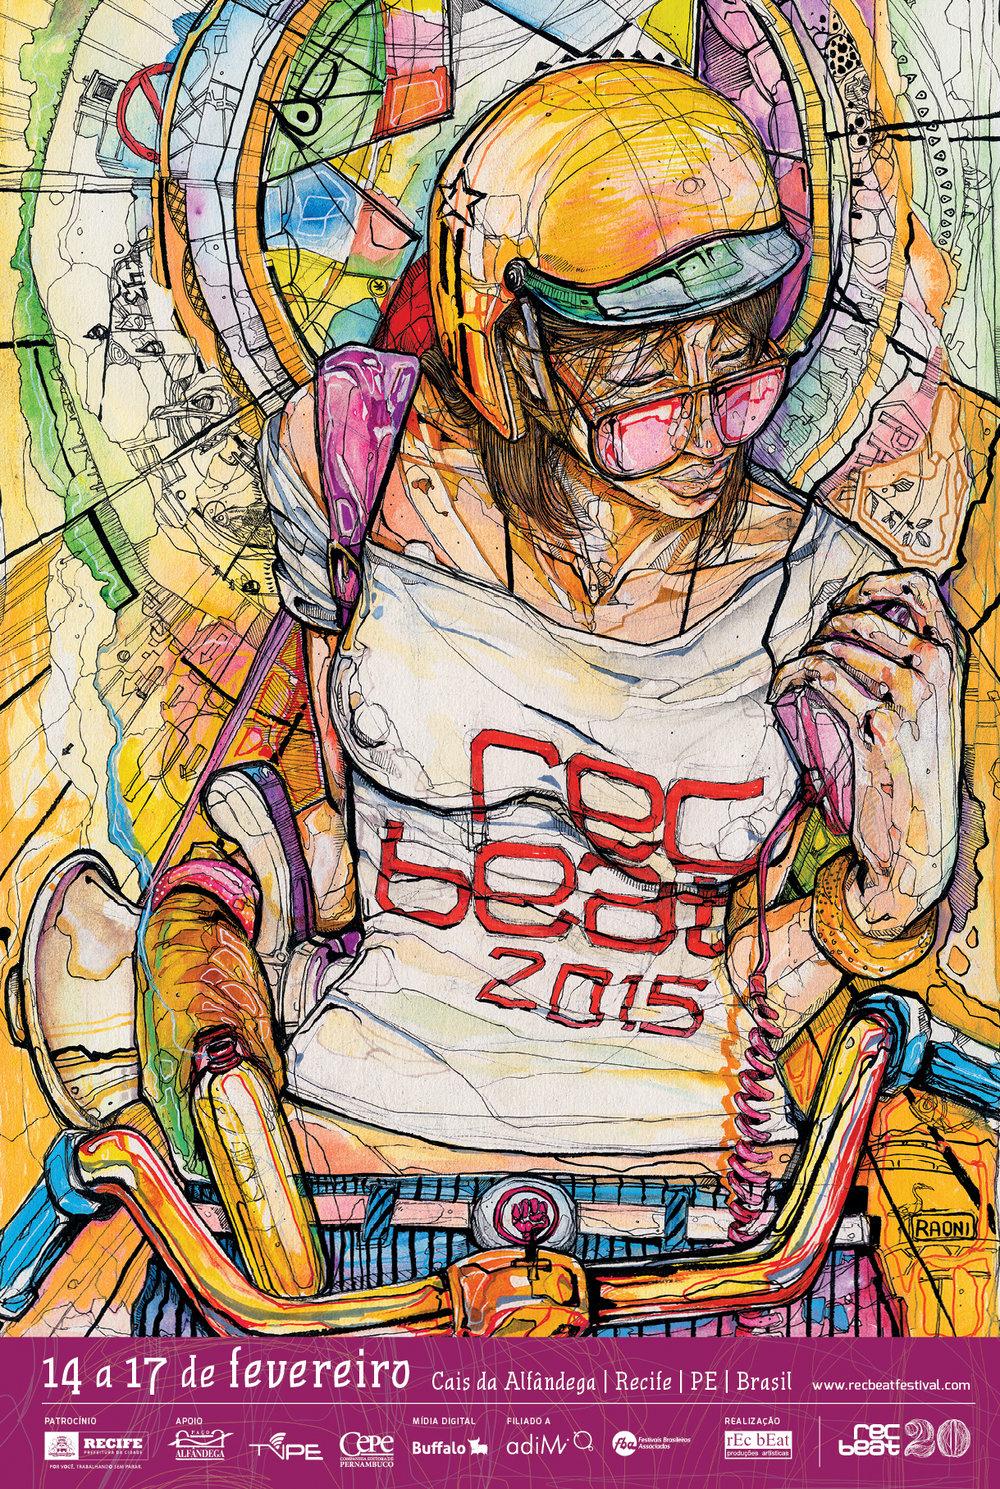 Recbeat2015-cartaz oficial 43x64-v4.jpg